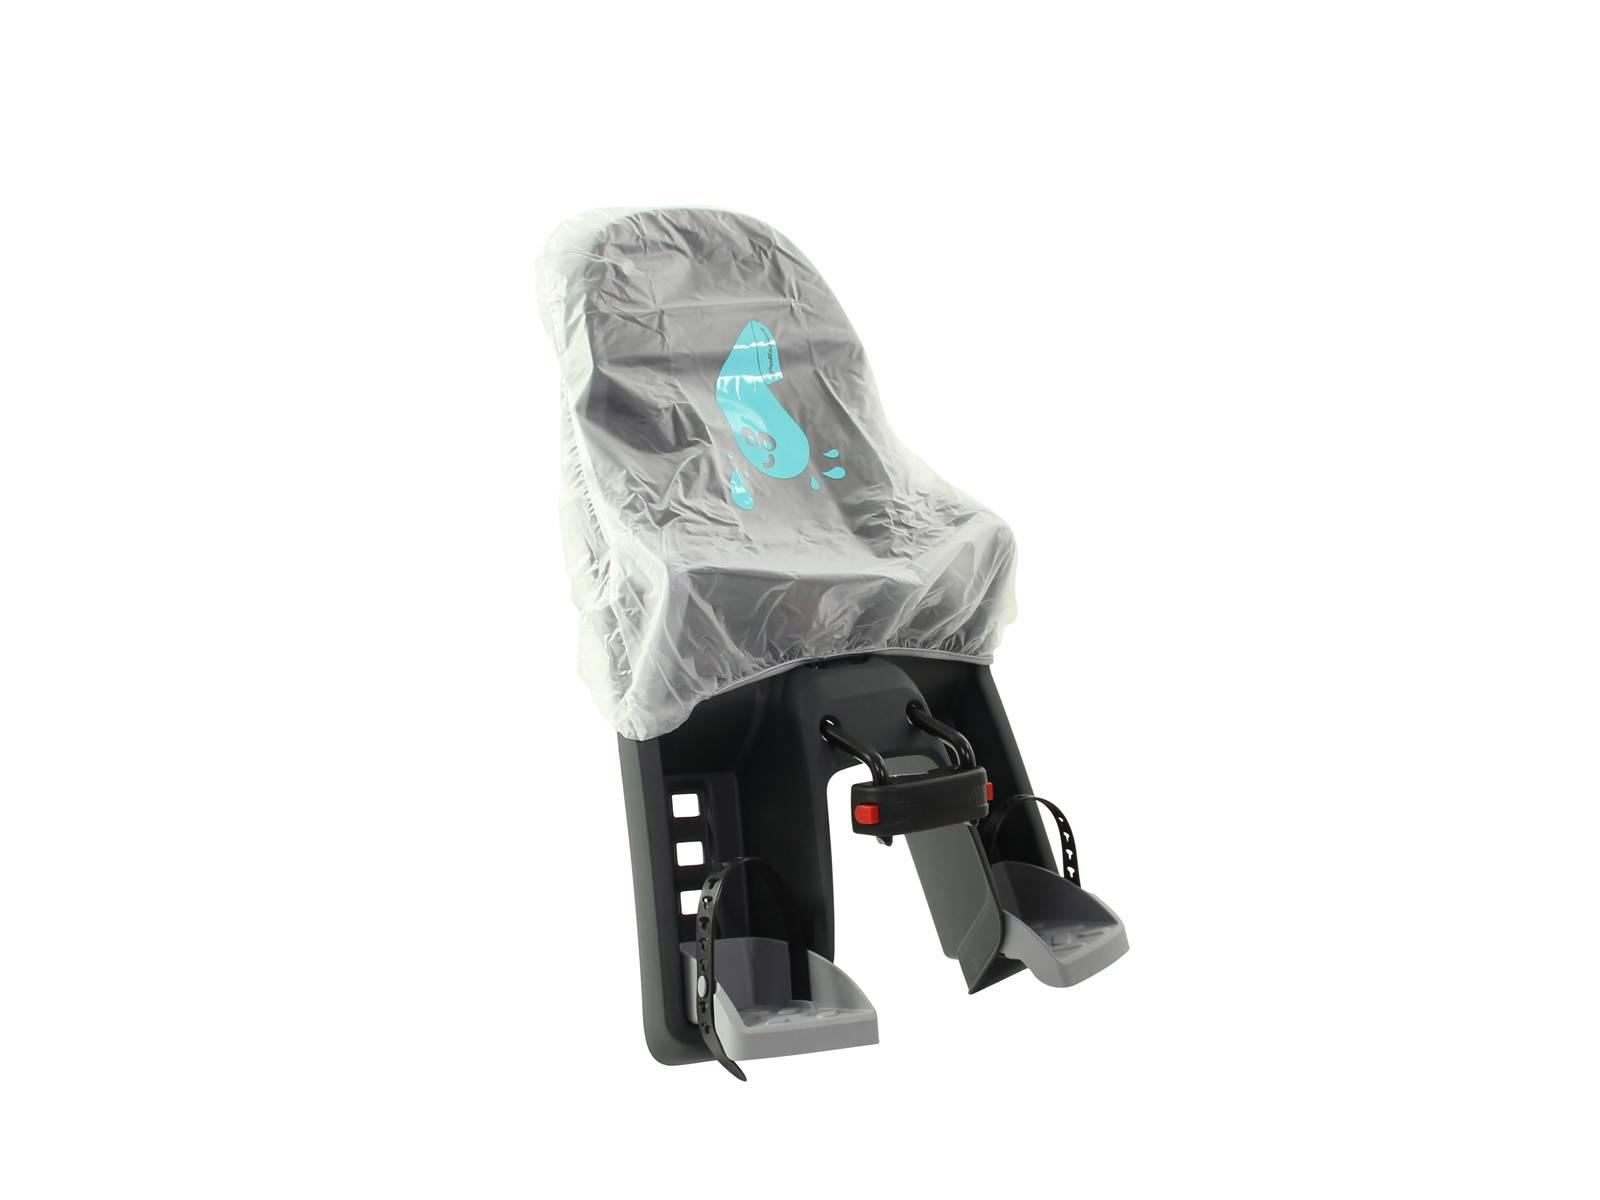 Polisport Regenschutzhaube Fahrrad Kindersitz für Guppy Mini